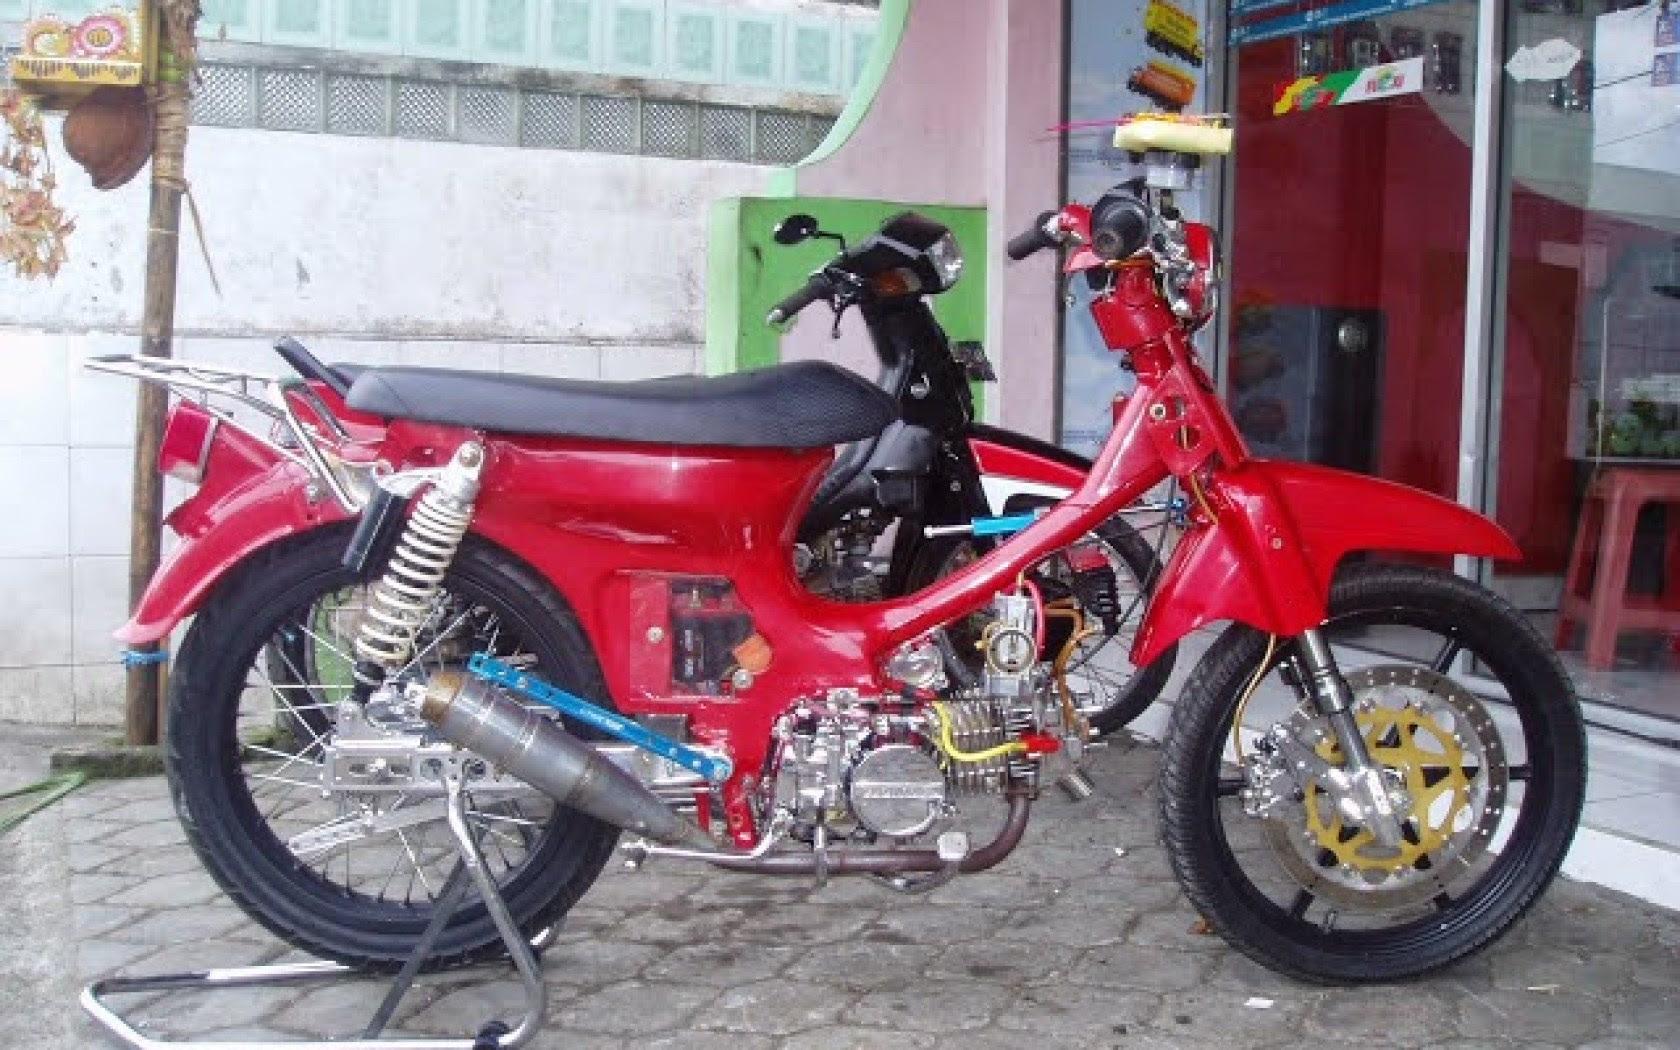 94 Modif Motor Astrea Impressa Terbaru Gendoel Motoer